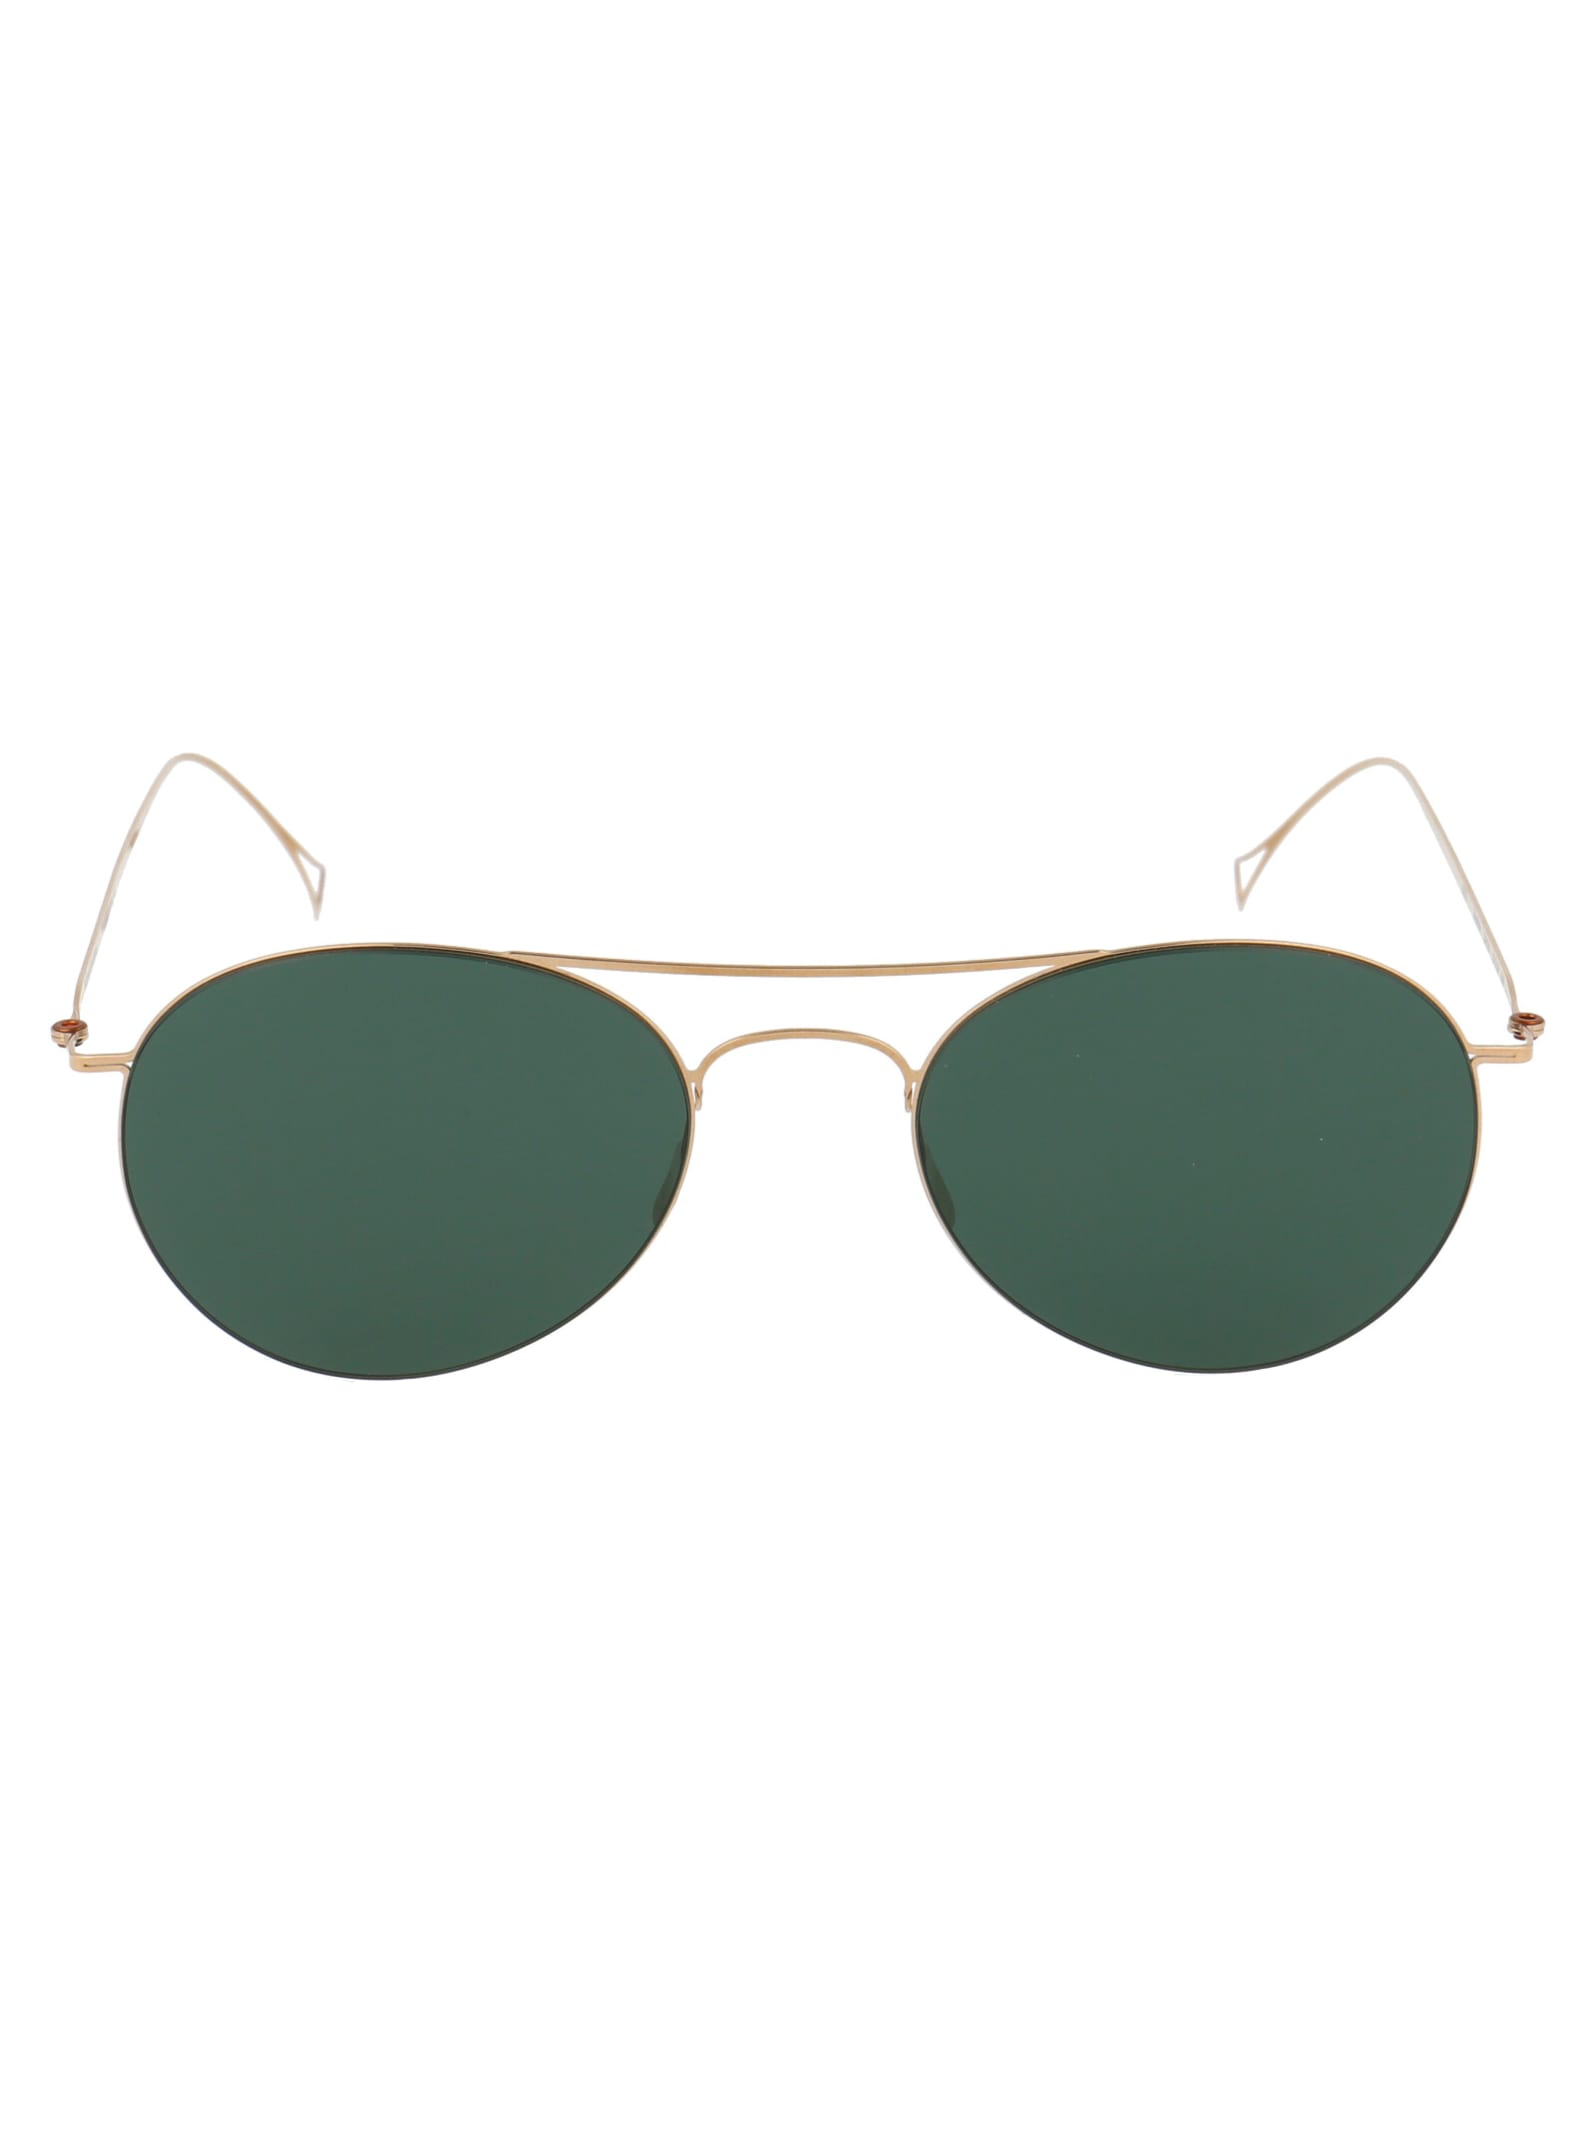 Hamilton Sunglasses